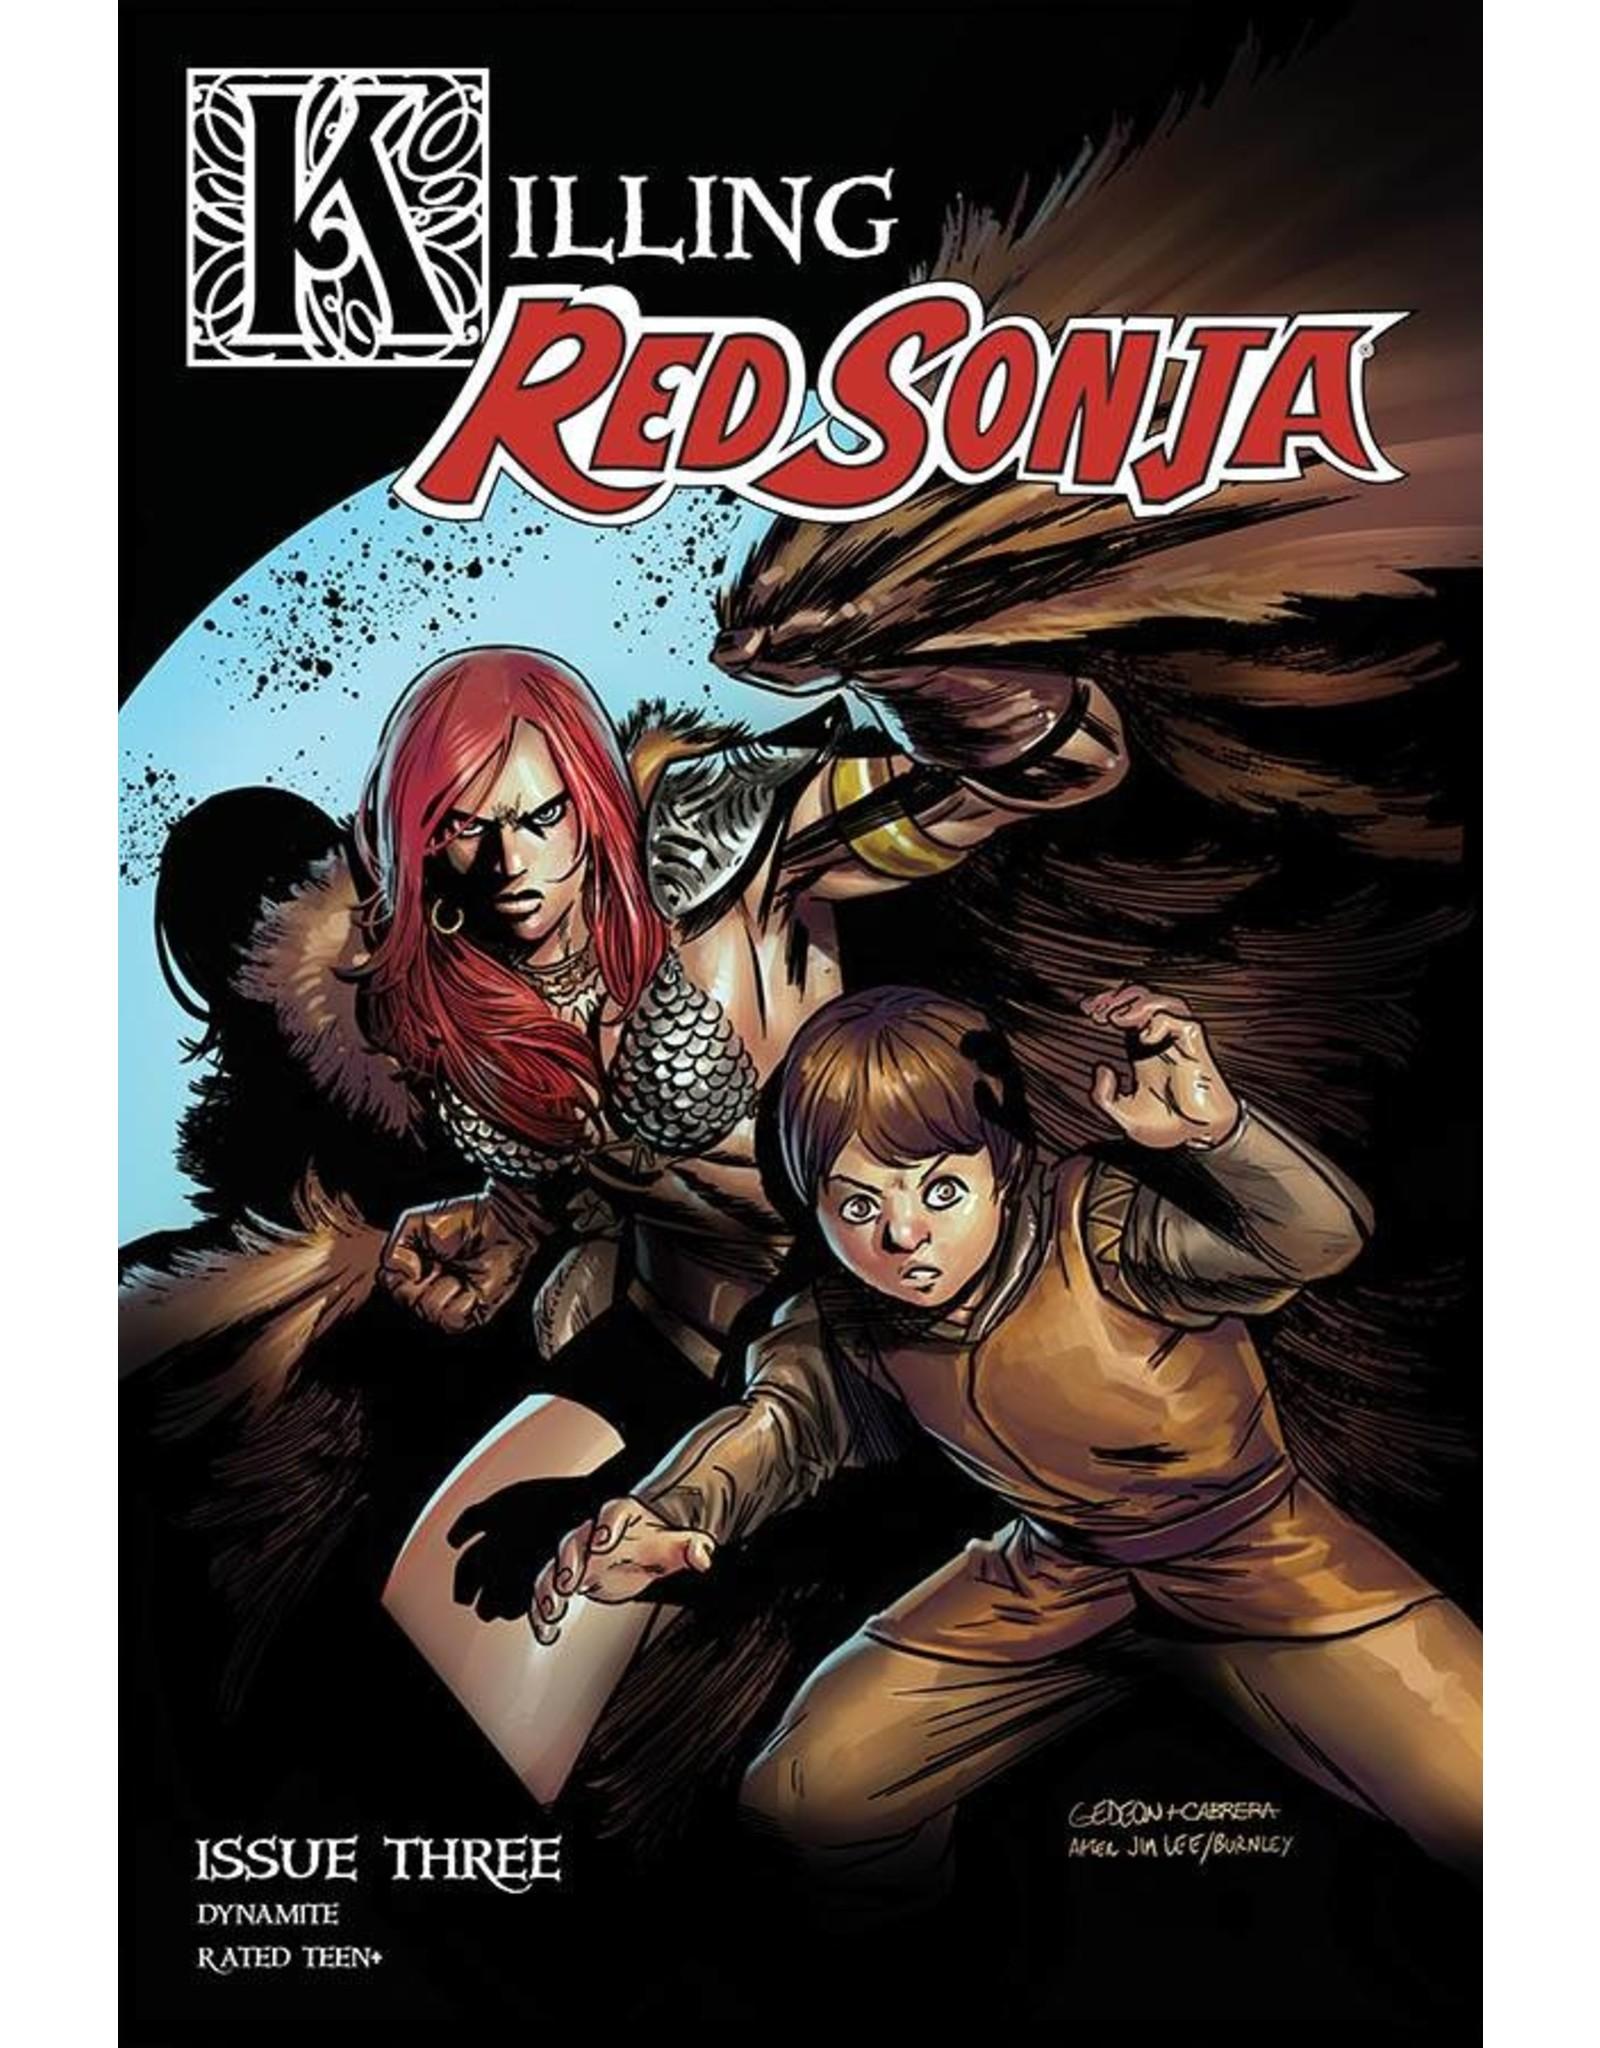 KILLING RED SONJA #3 CVR B GEDEON HOMAGE